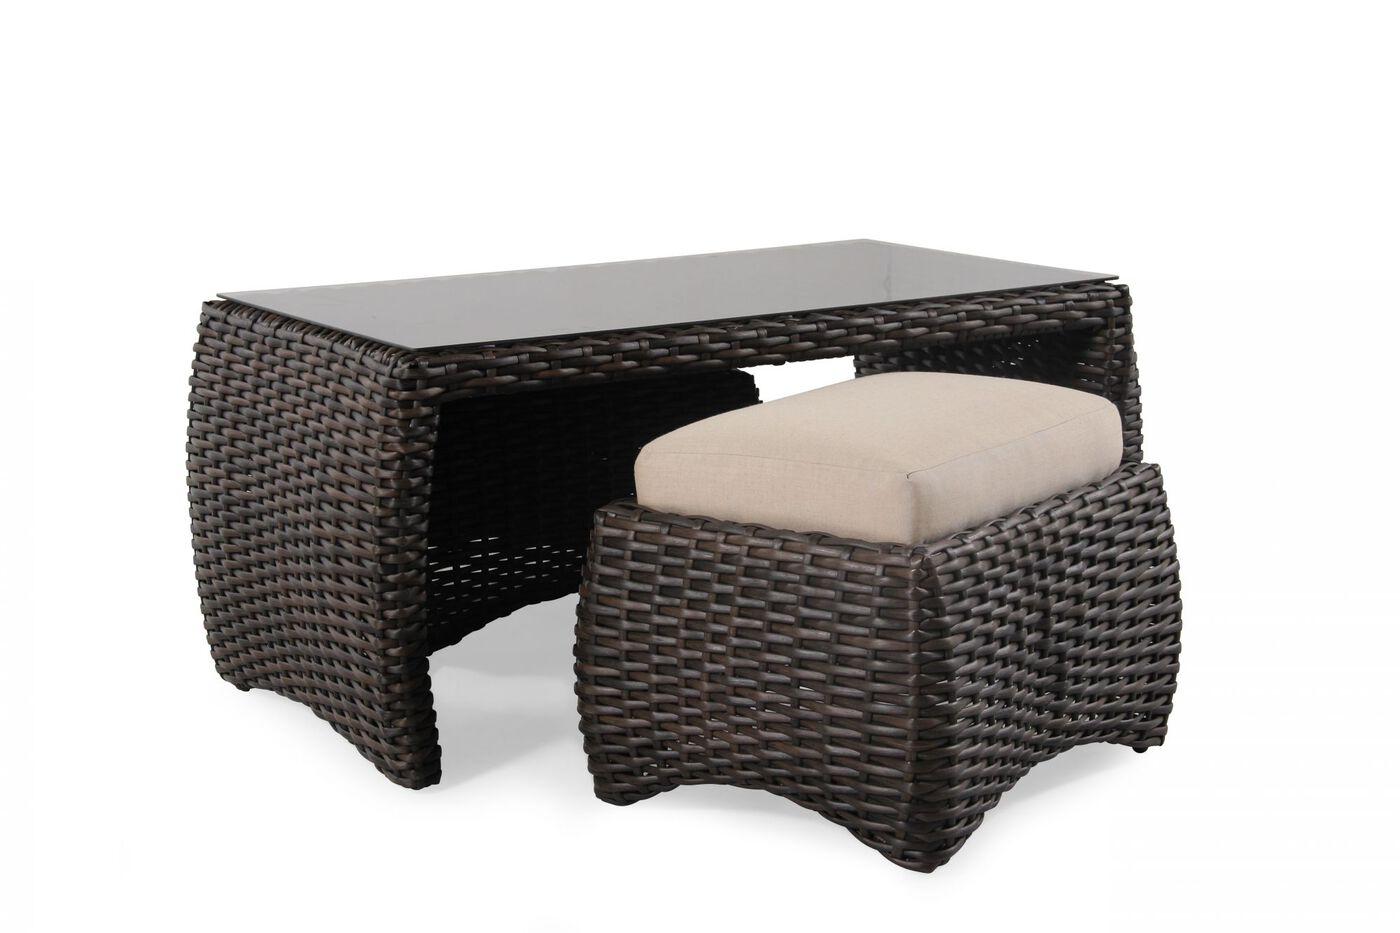 Agio hudson coffee table set mathis brothers furniture agio hudson coffee table set geotapseo Images